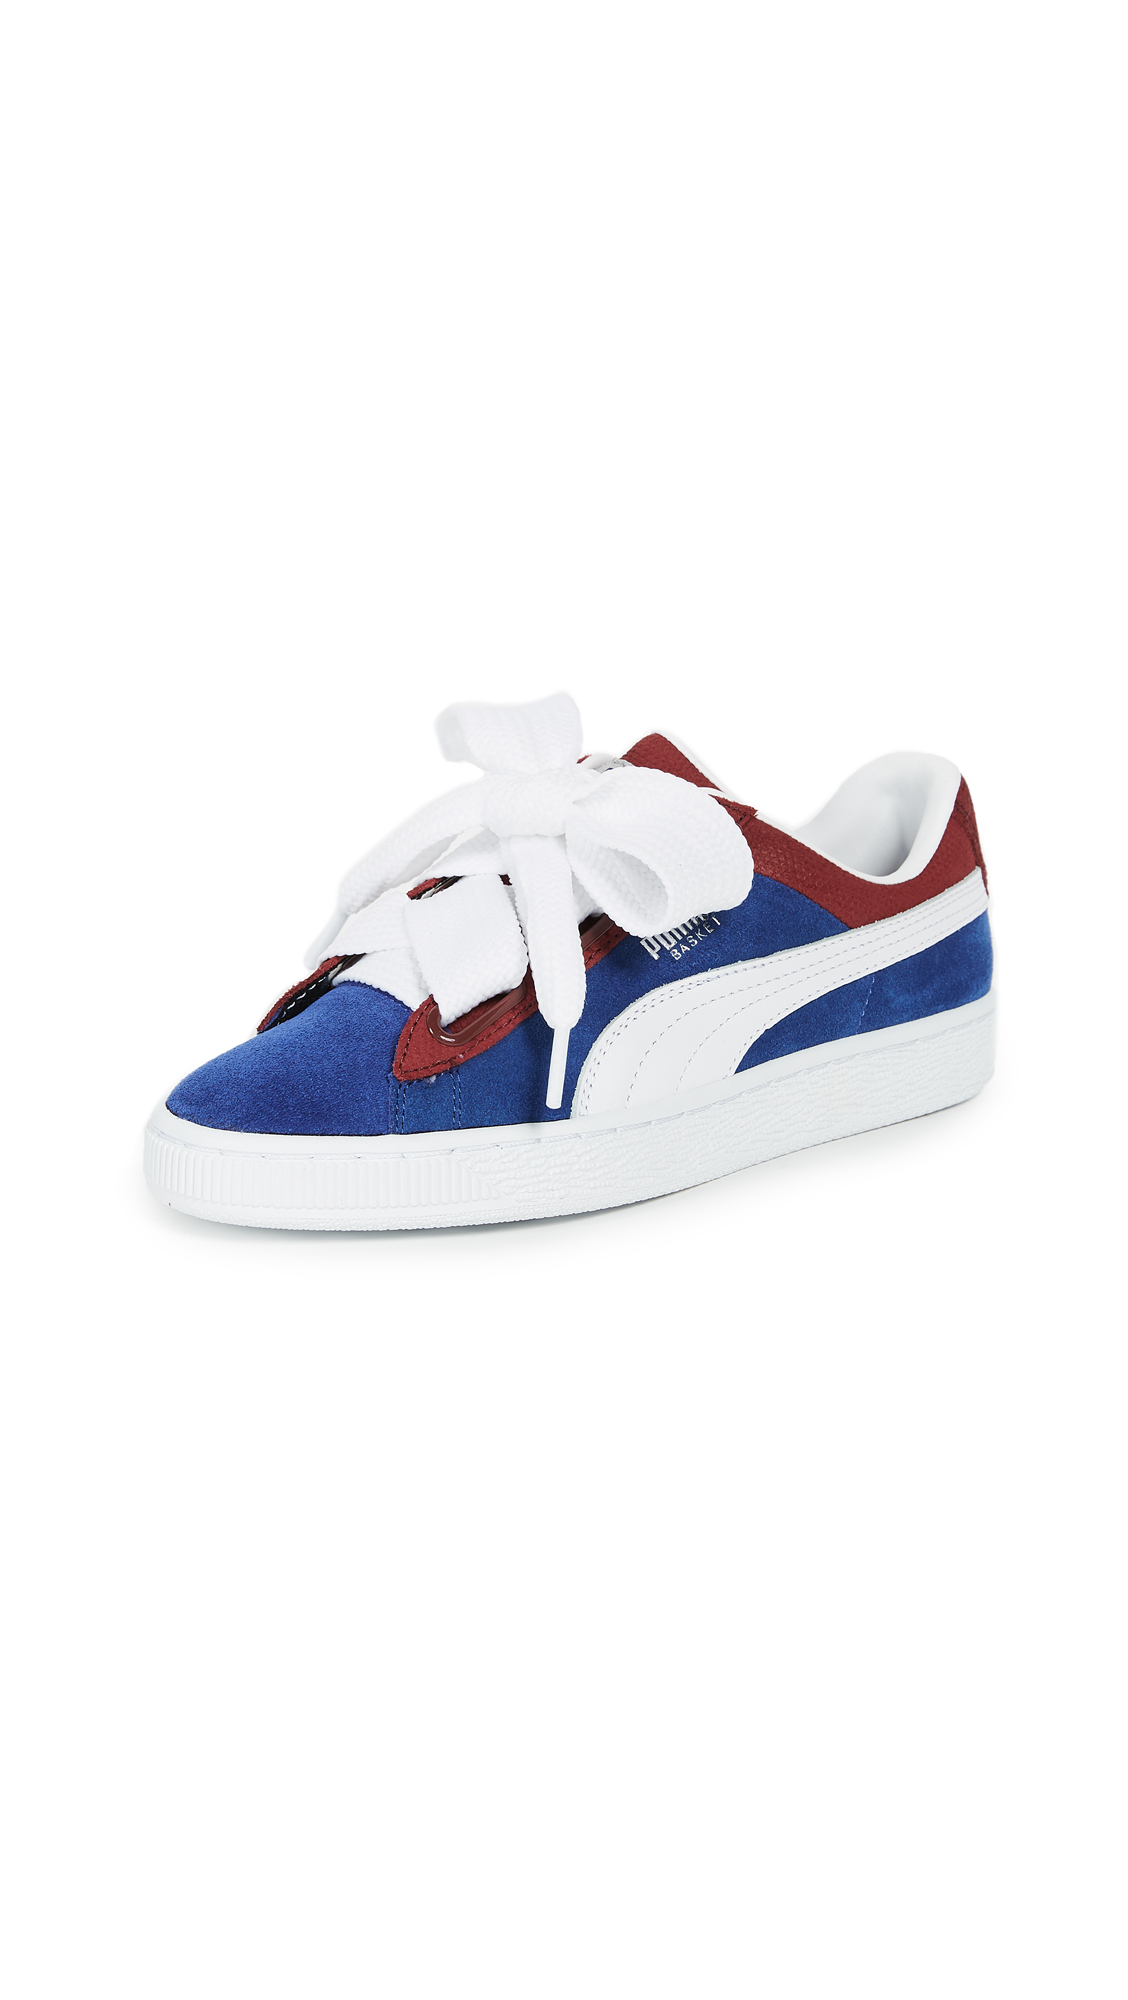 PUMA Basket Heart Colorblock Sneakers - True Blue/Cabaret